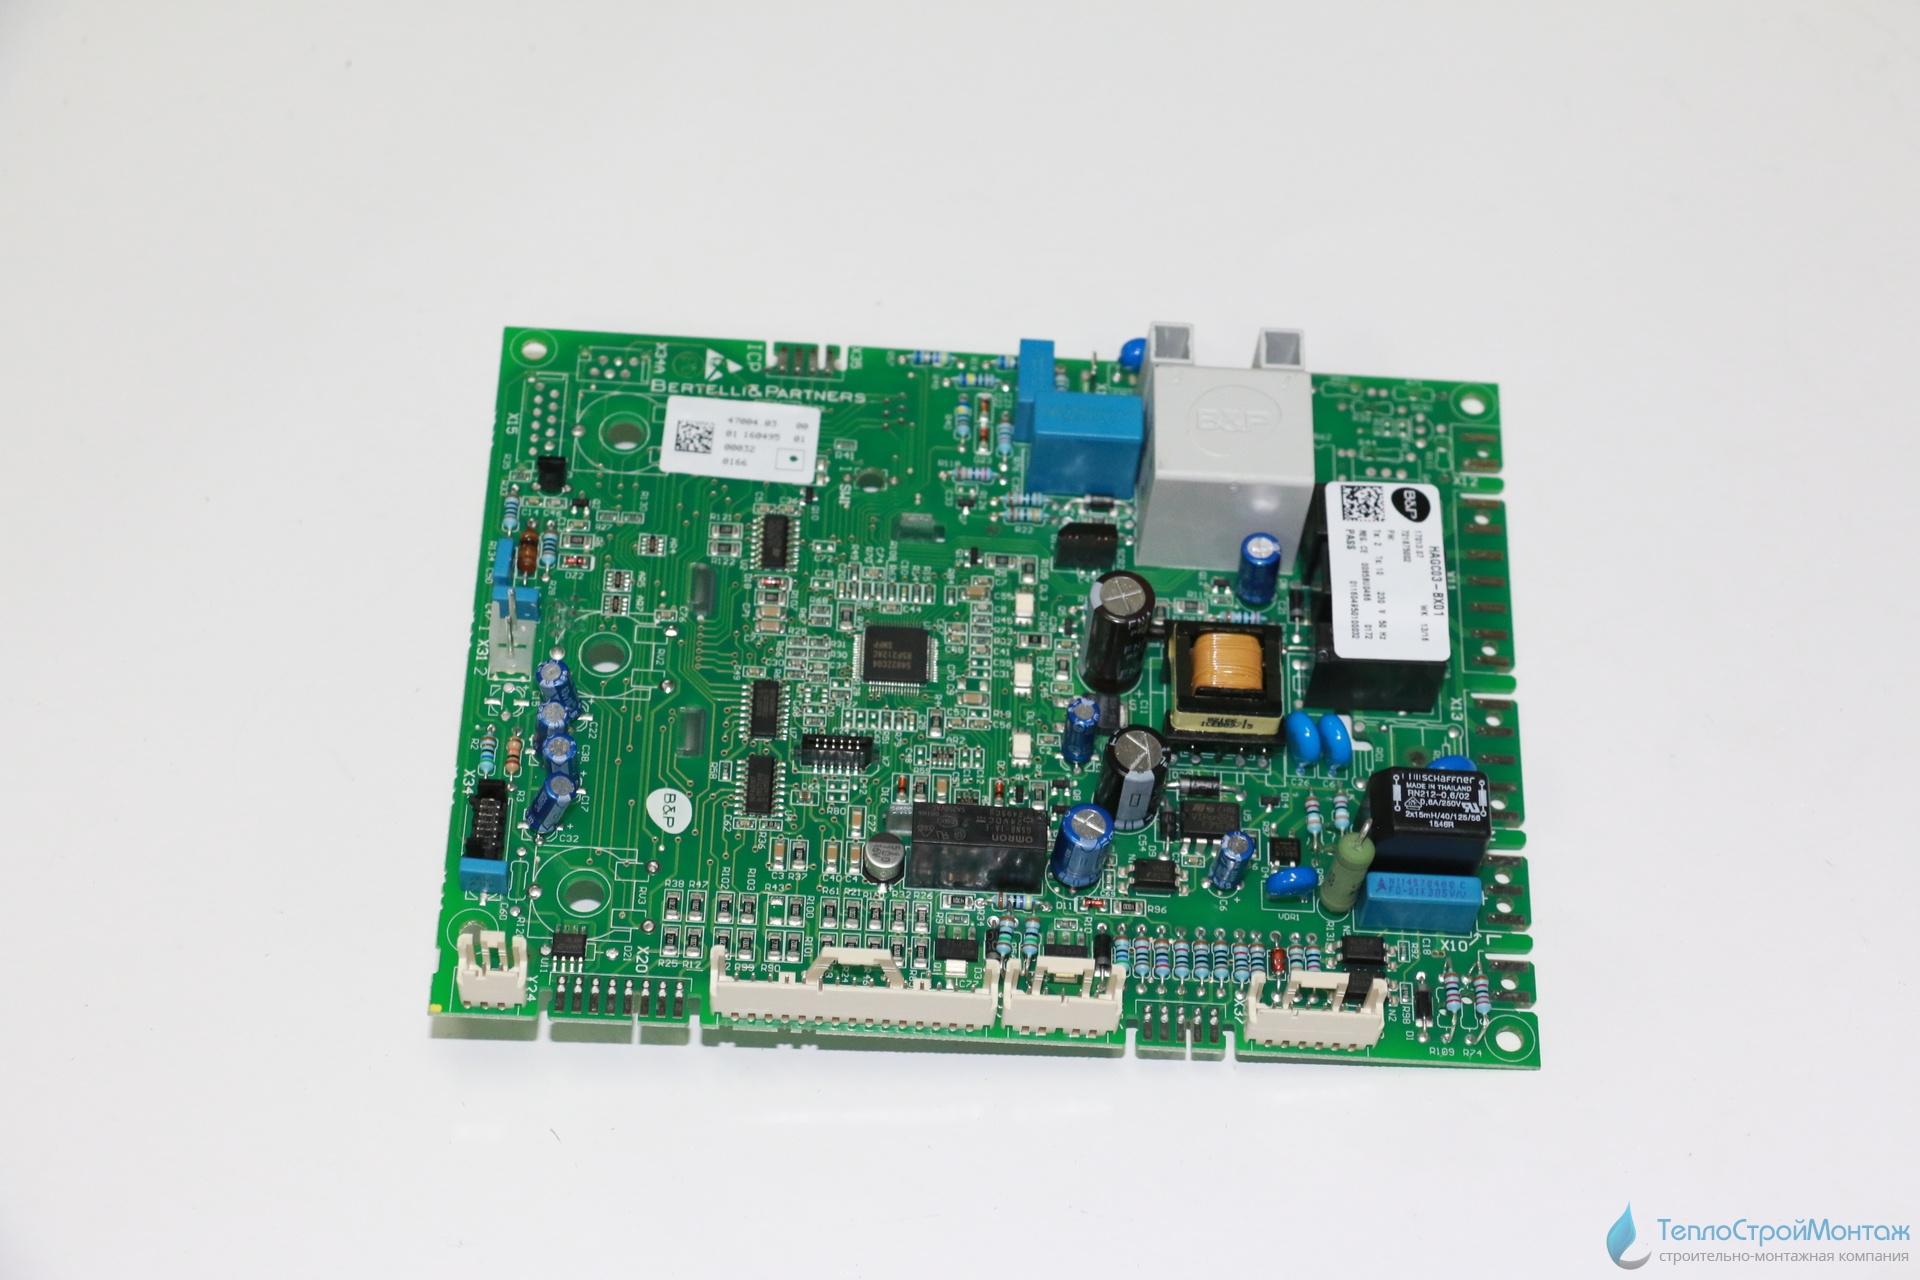 767905600 (722233100) Электронная плата DUO-TEC COMPACT,LUNA DUO-TEC, NUVOLA DUO-TEC